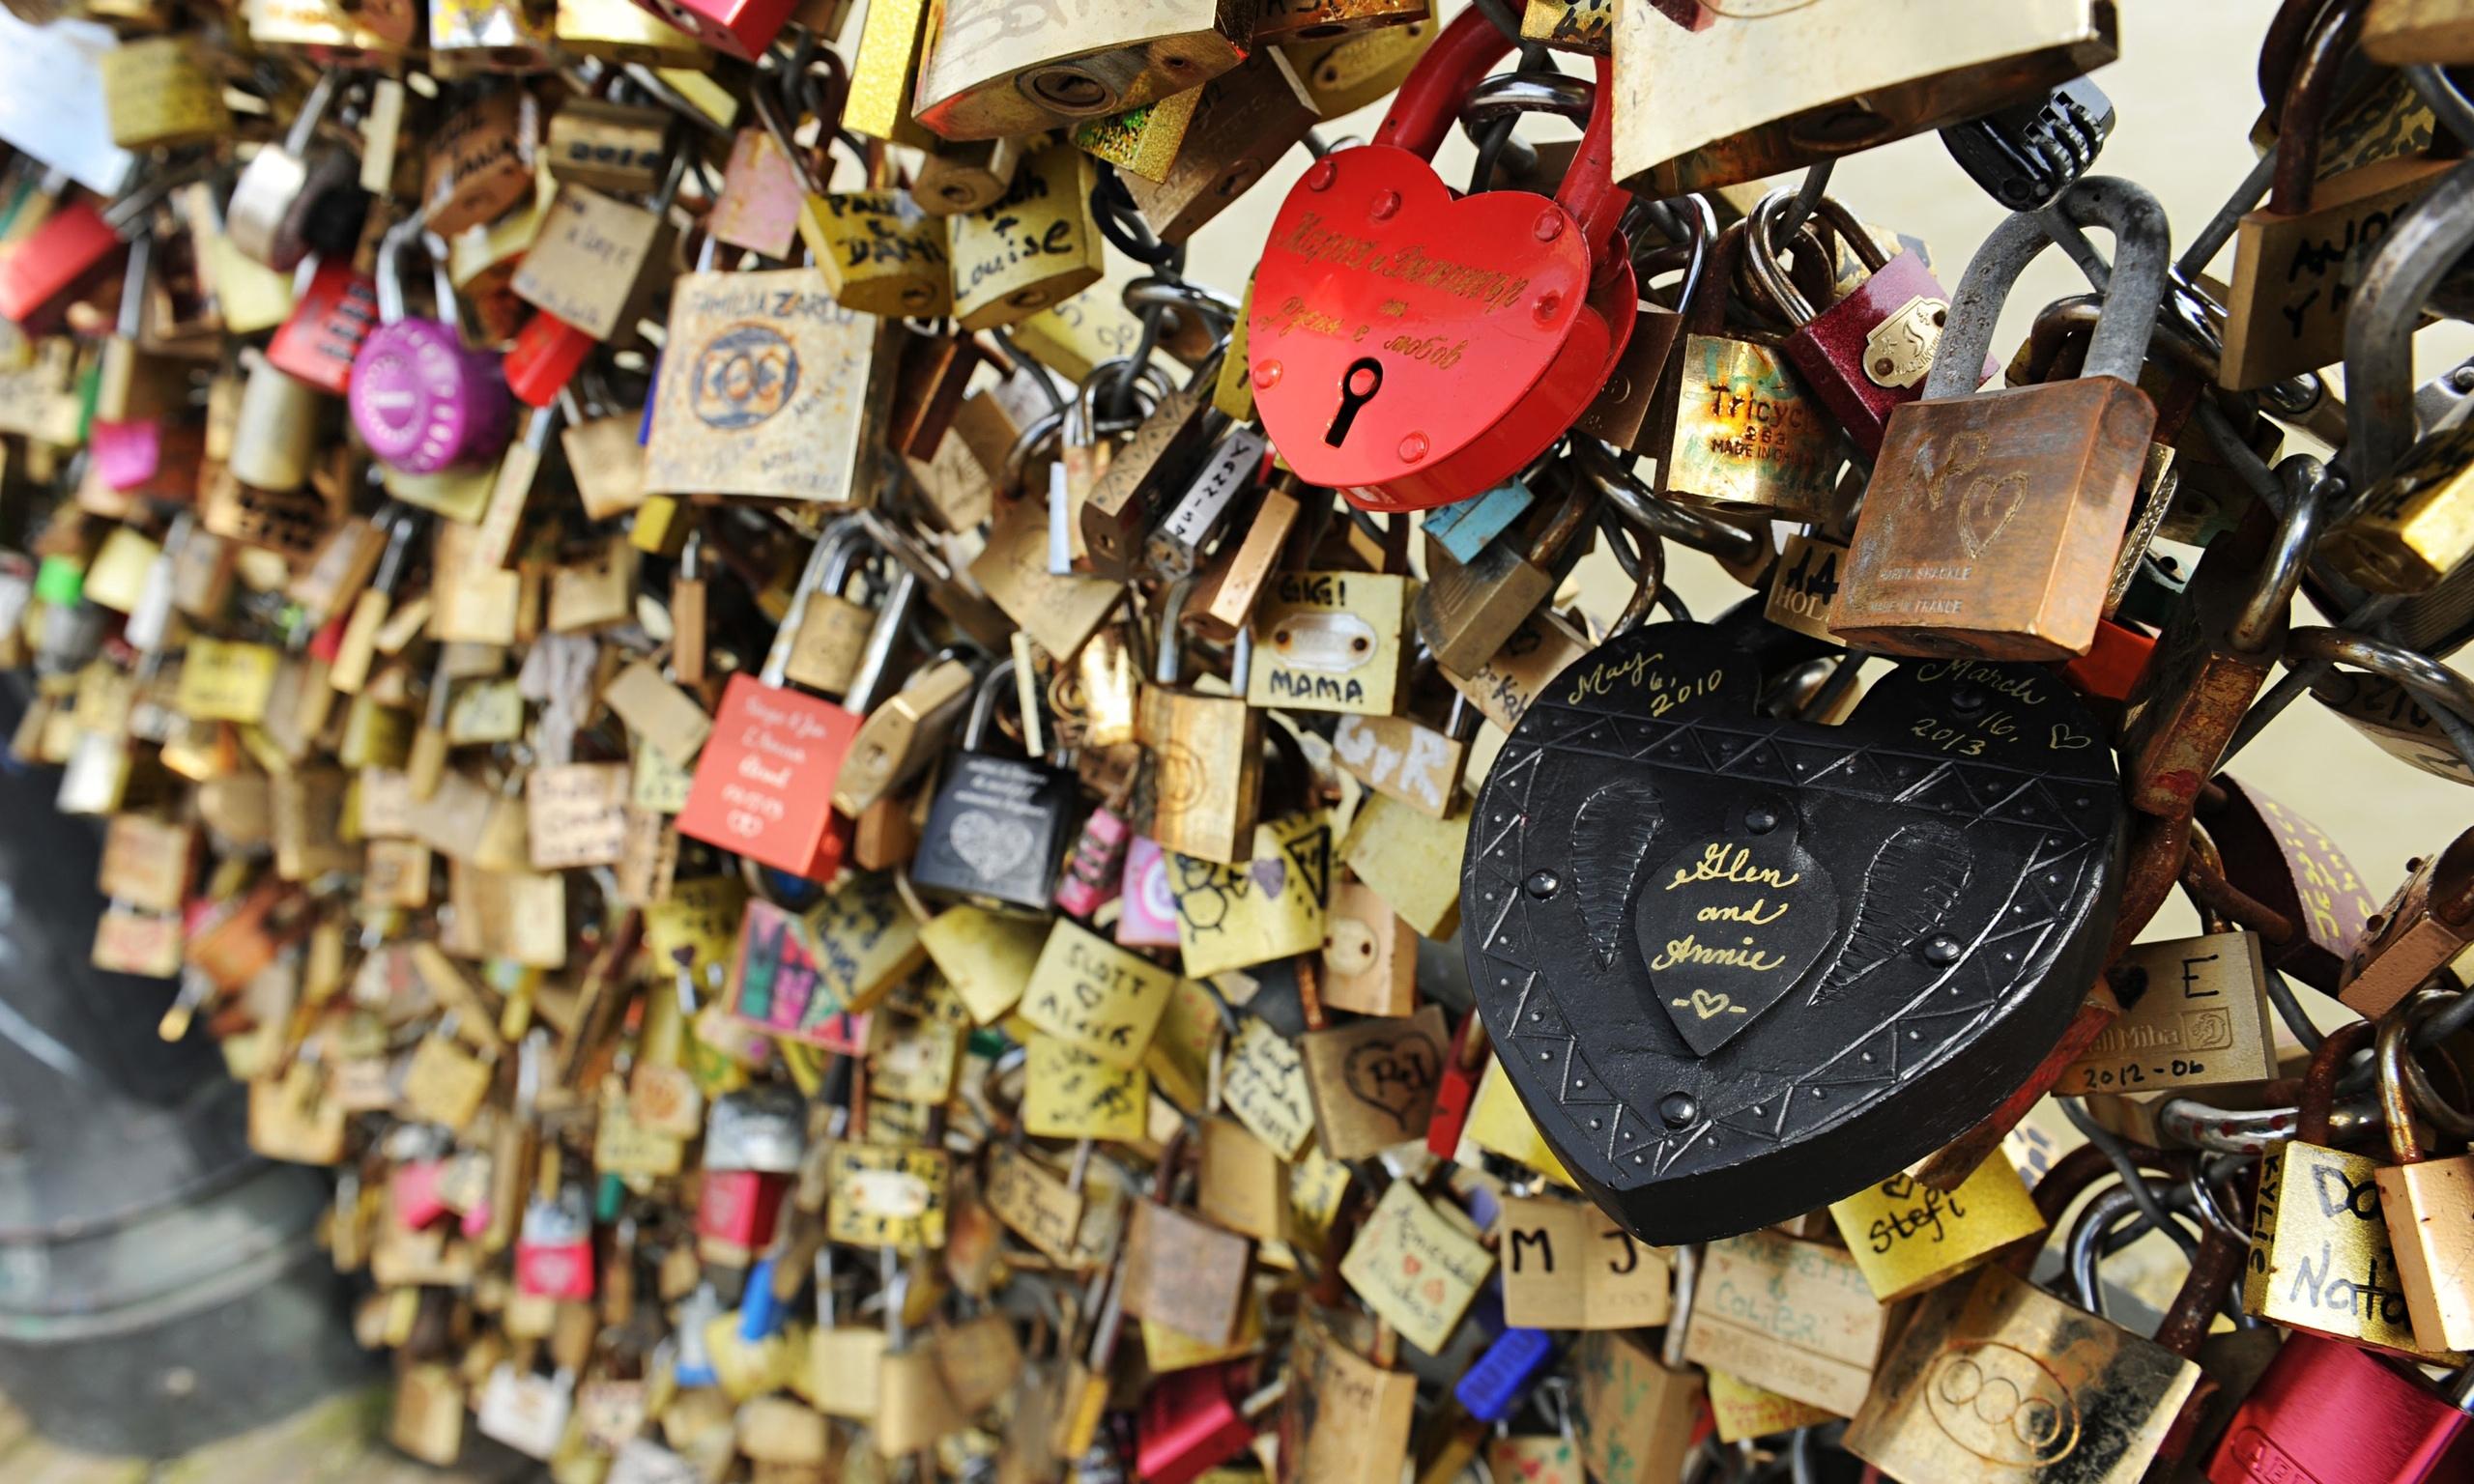 Love locks break bridges - and make me hate romance | Stuart ...